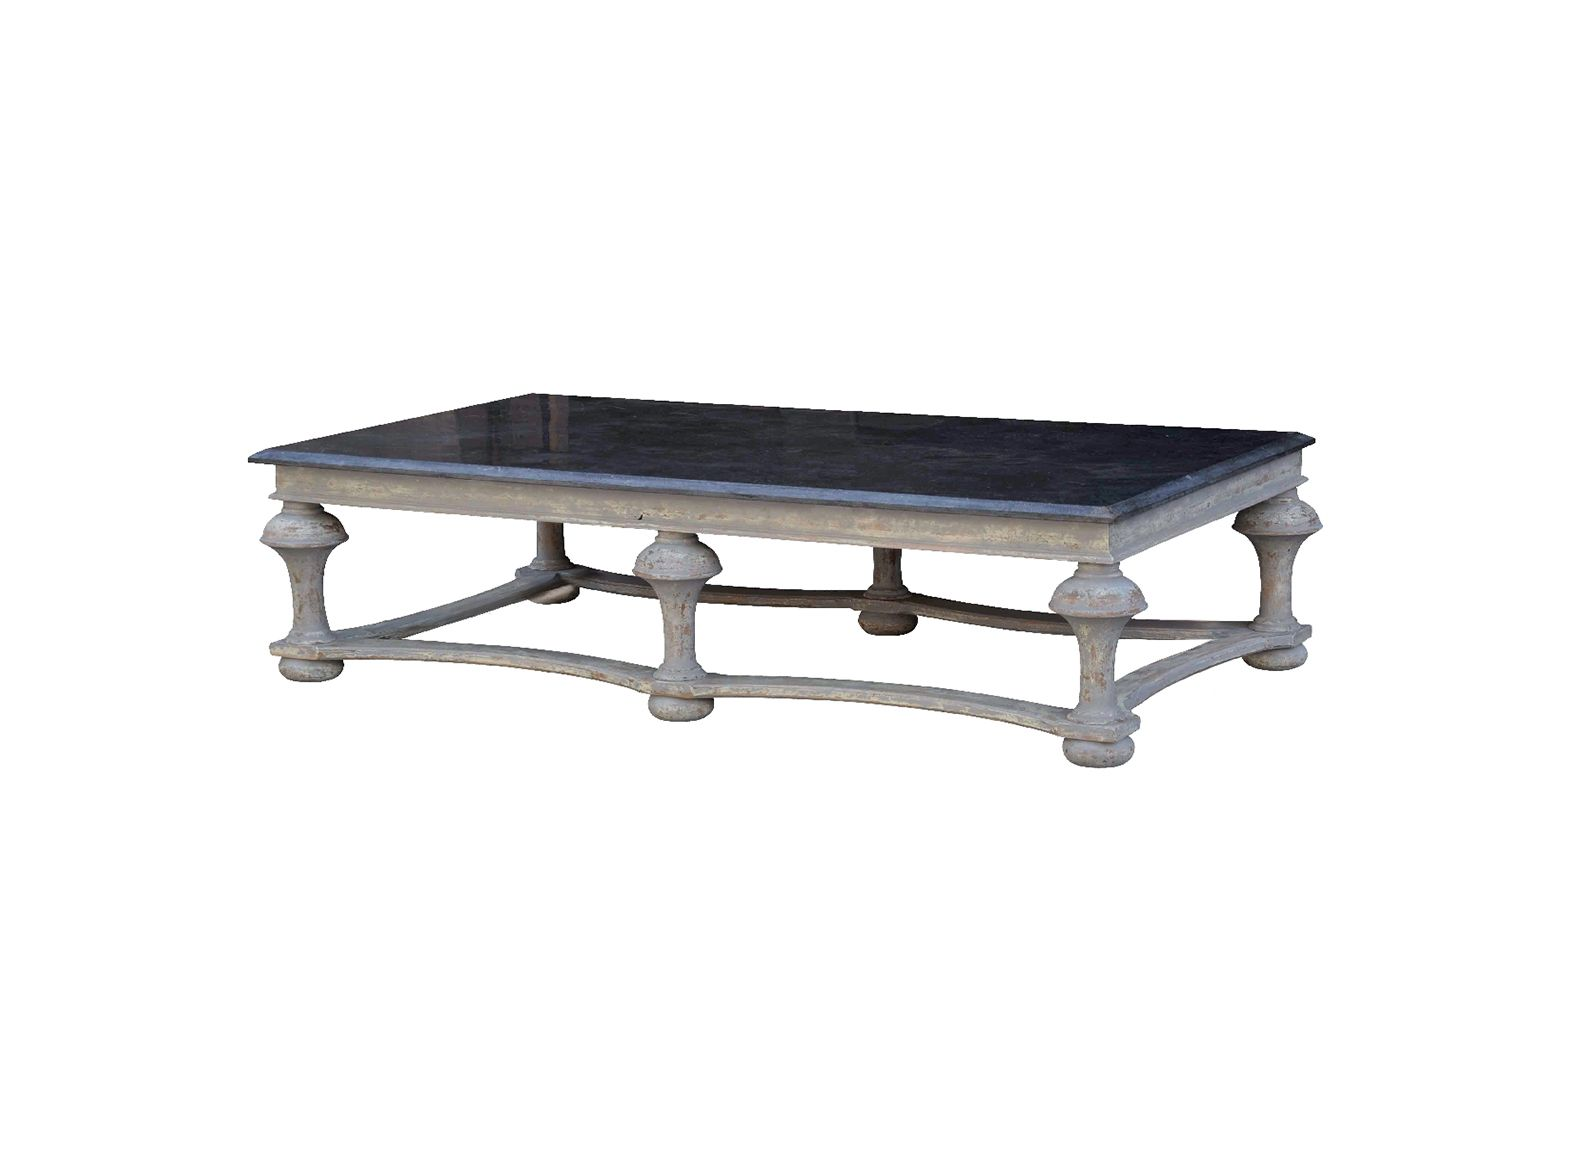 table basse signature 6 pieds plateau pierre bleue givenchy. Black Bedroom Furniture Sets. Home Design Ideas